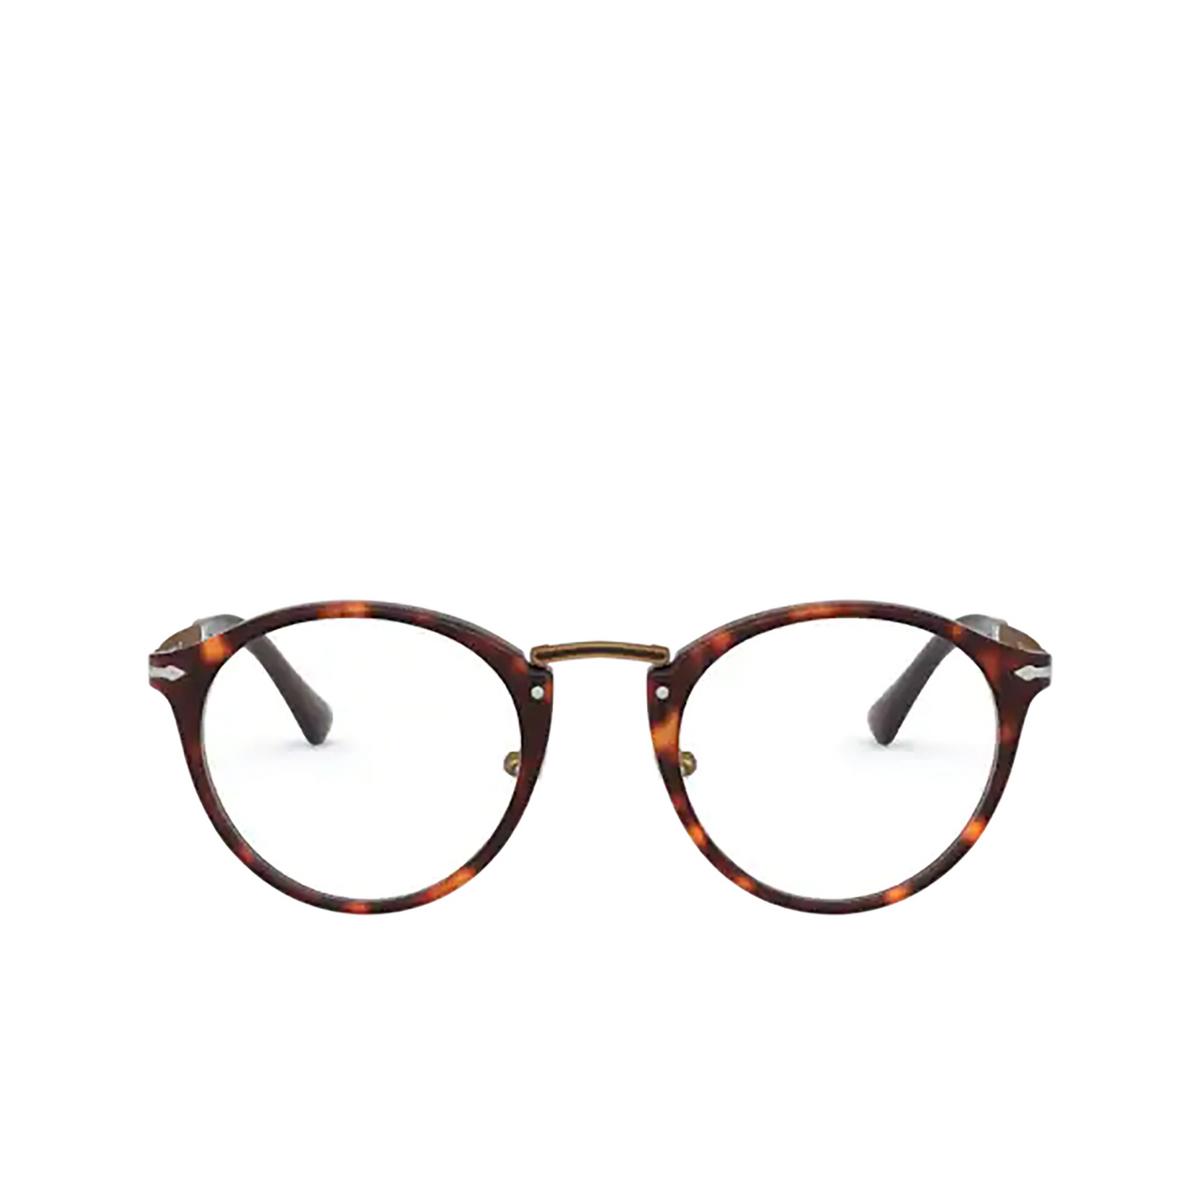 Persol® Round Eyeglasses: PO3248V color Havana 24 - front view.